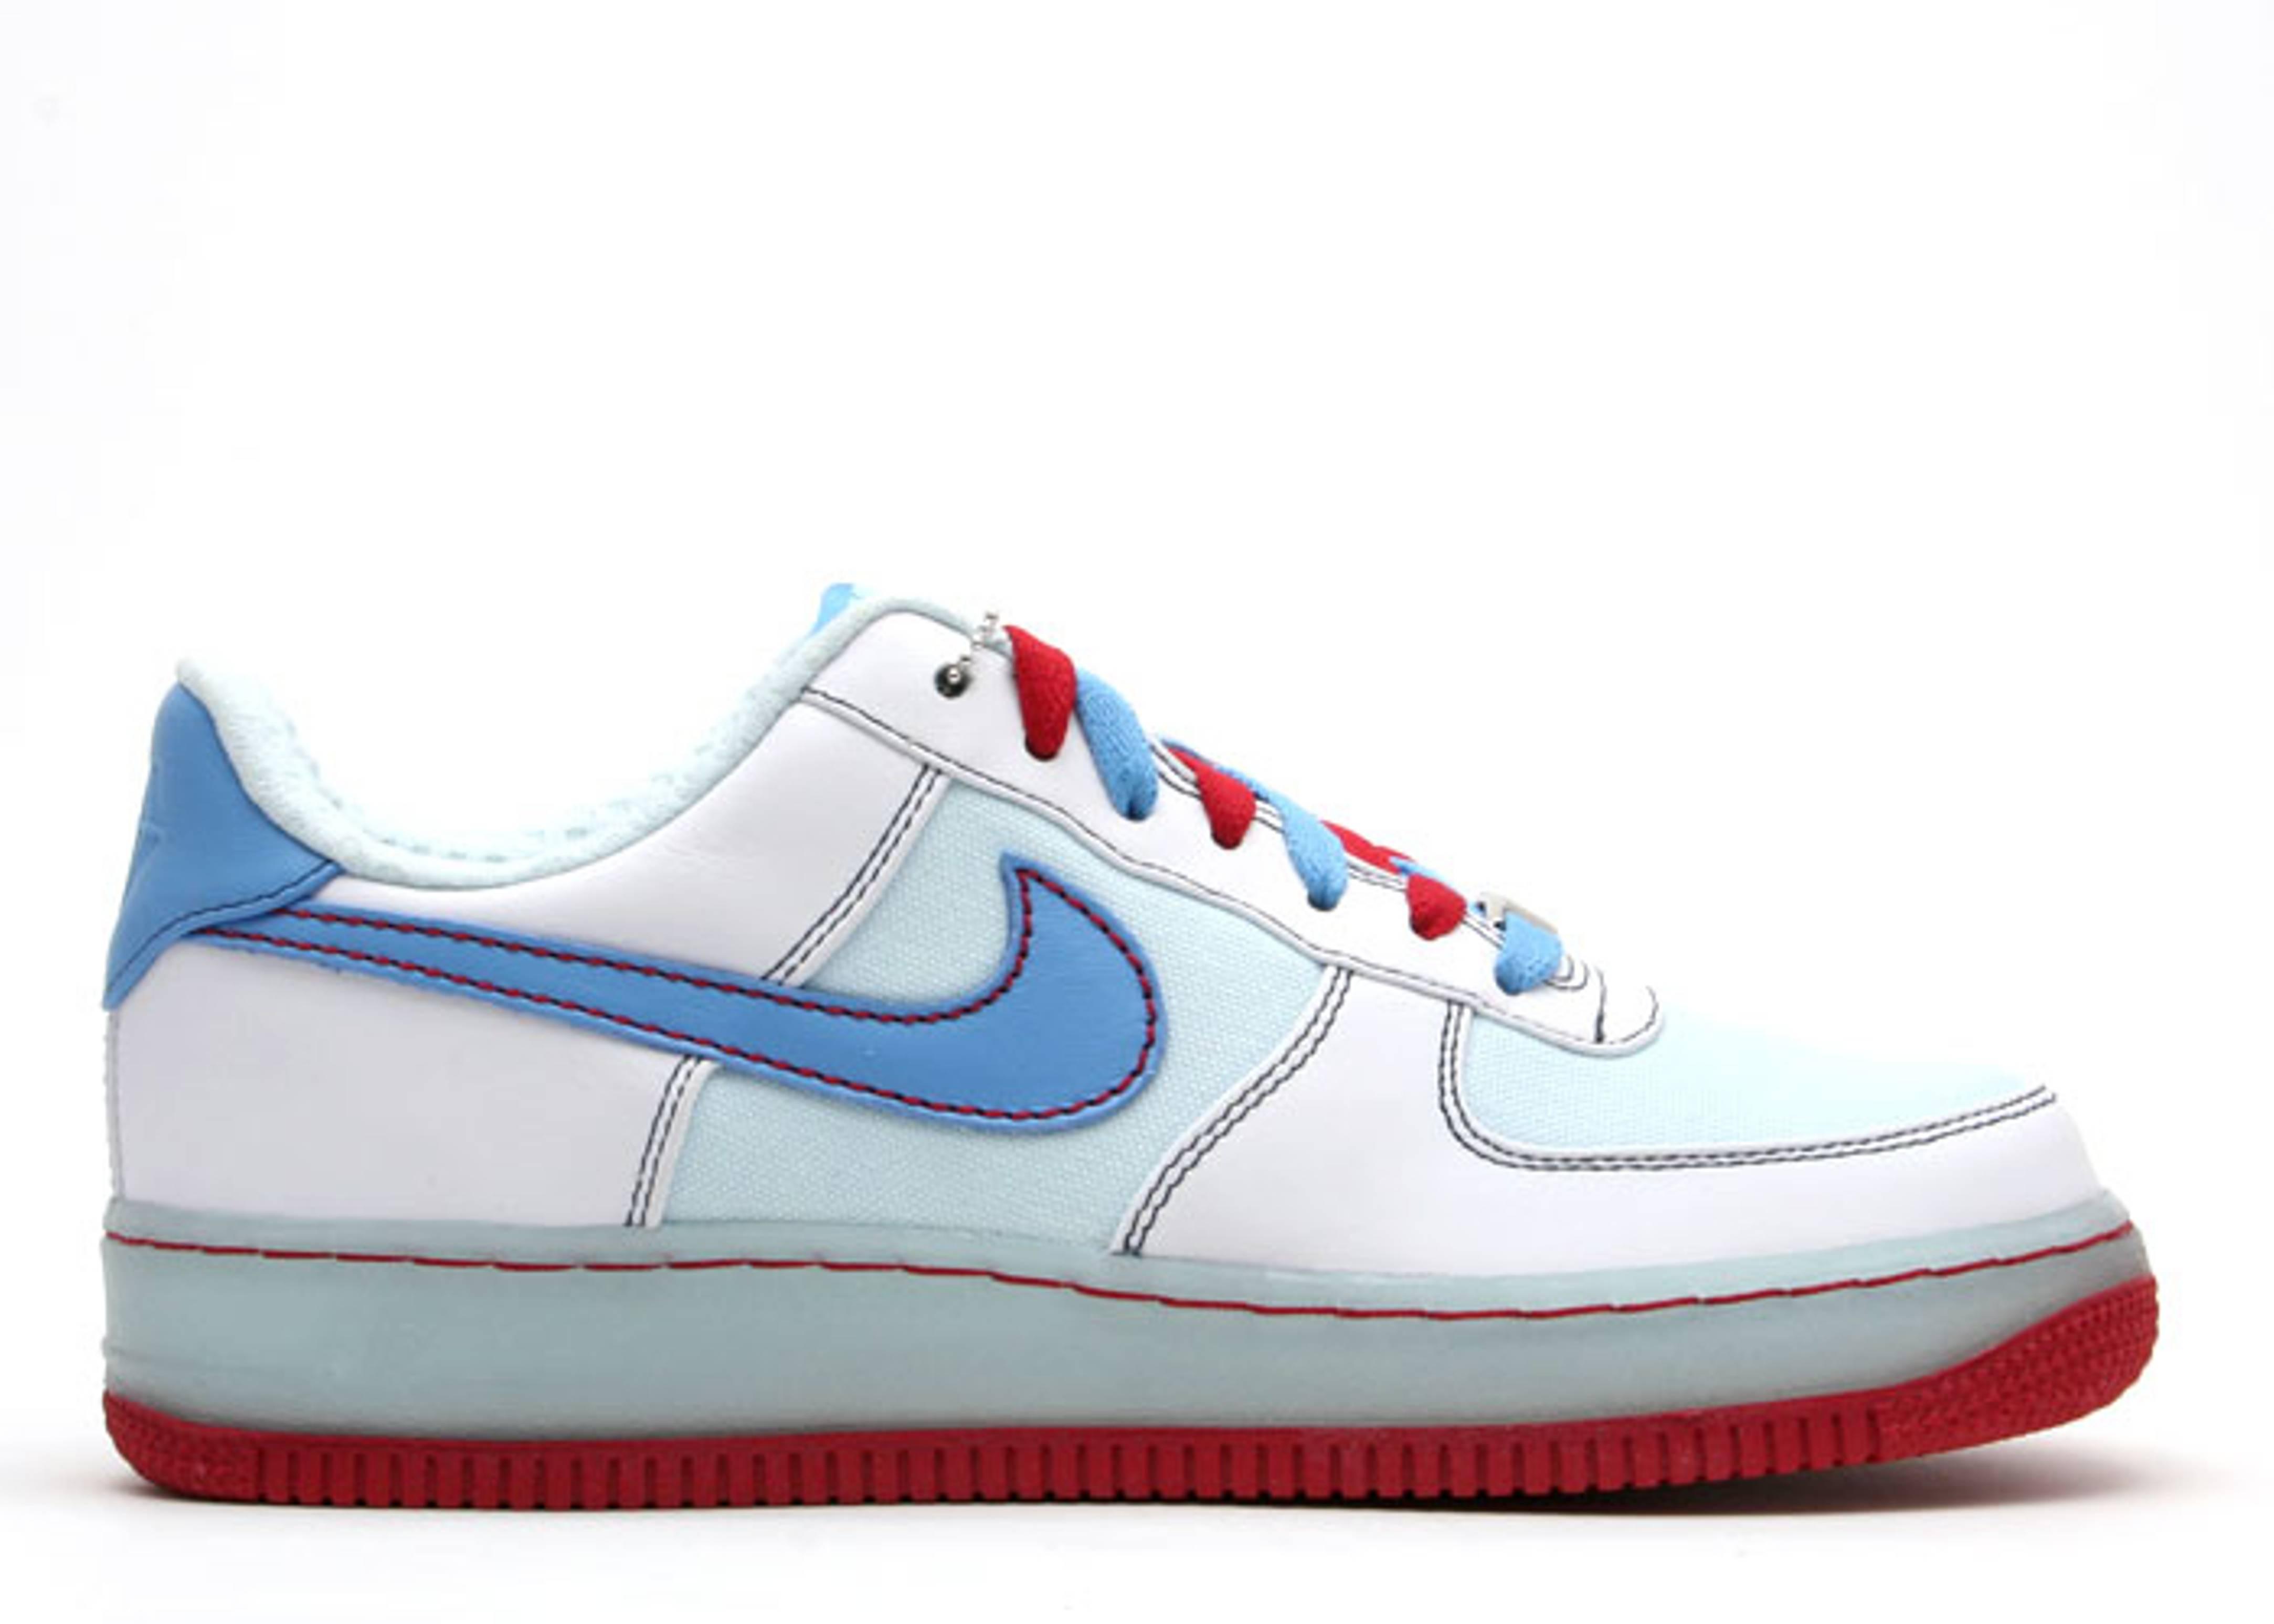 nike air force 1 glacier blue